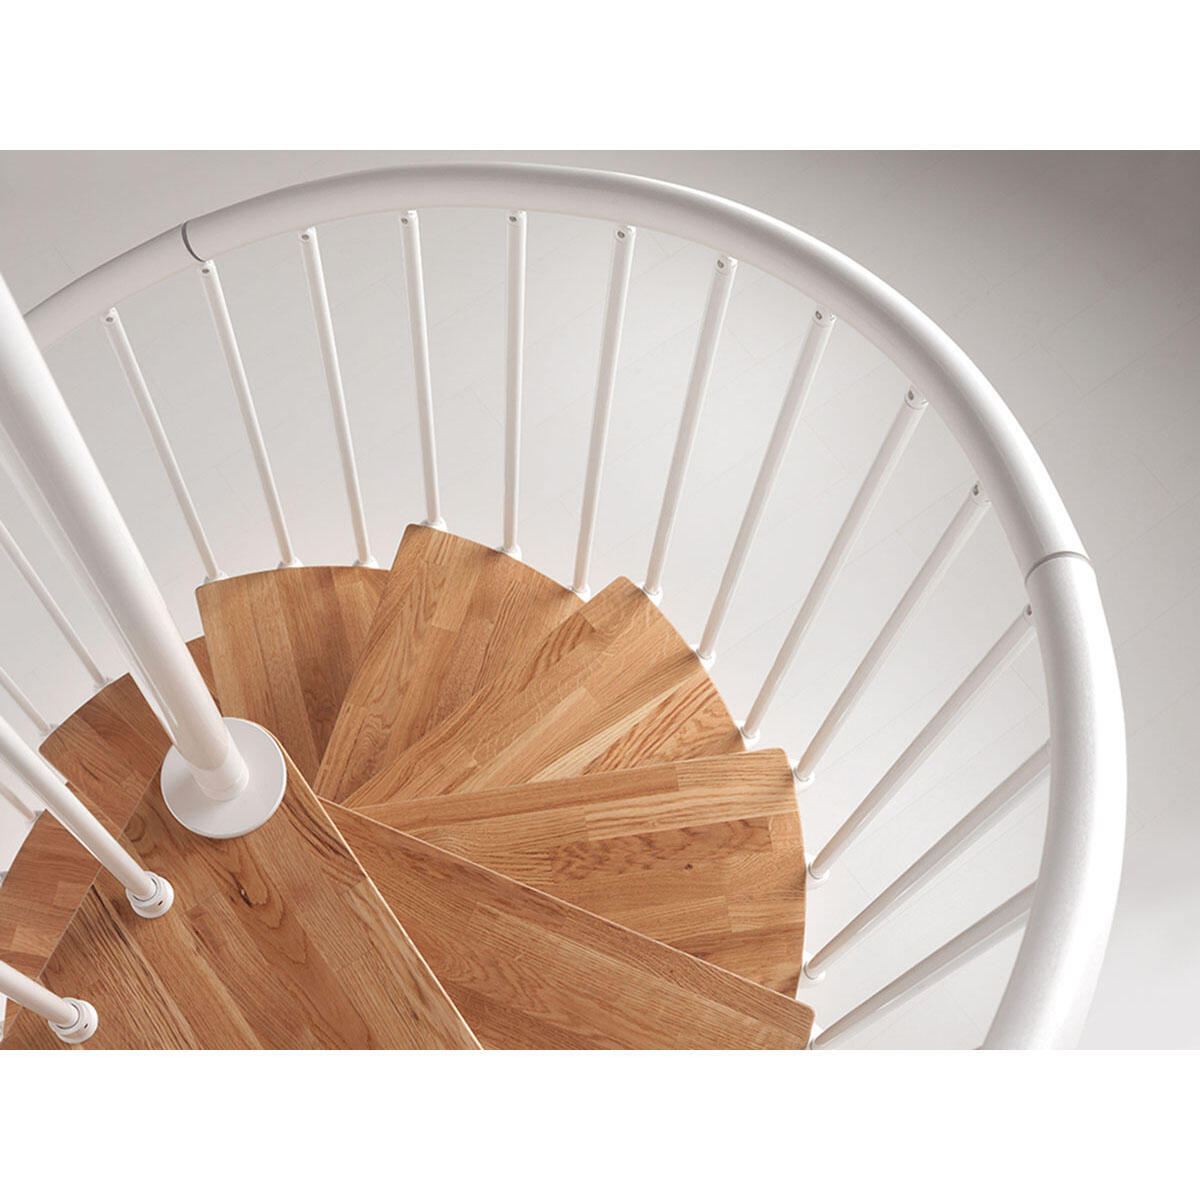 Scala a chiocciola tonda OAK70 FONTANOT L 130 cm, gradino naturale, struttura bianco - 7